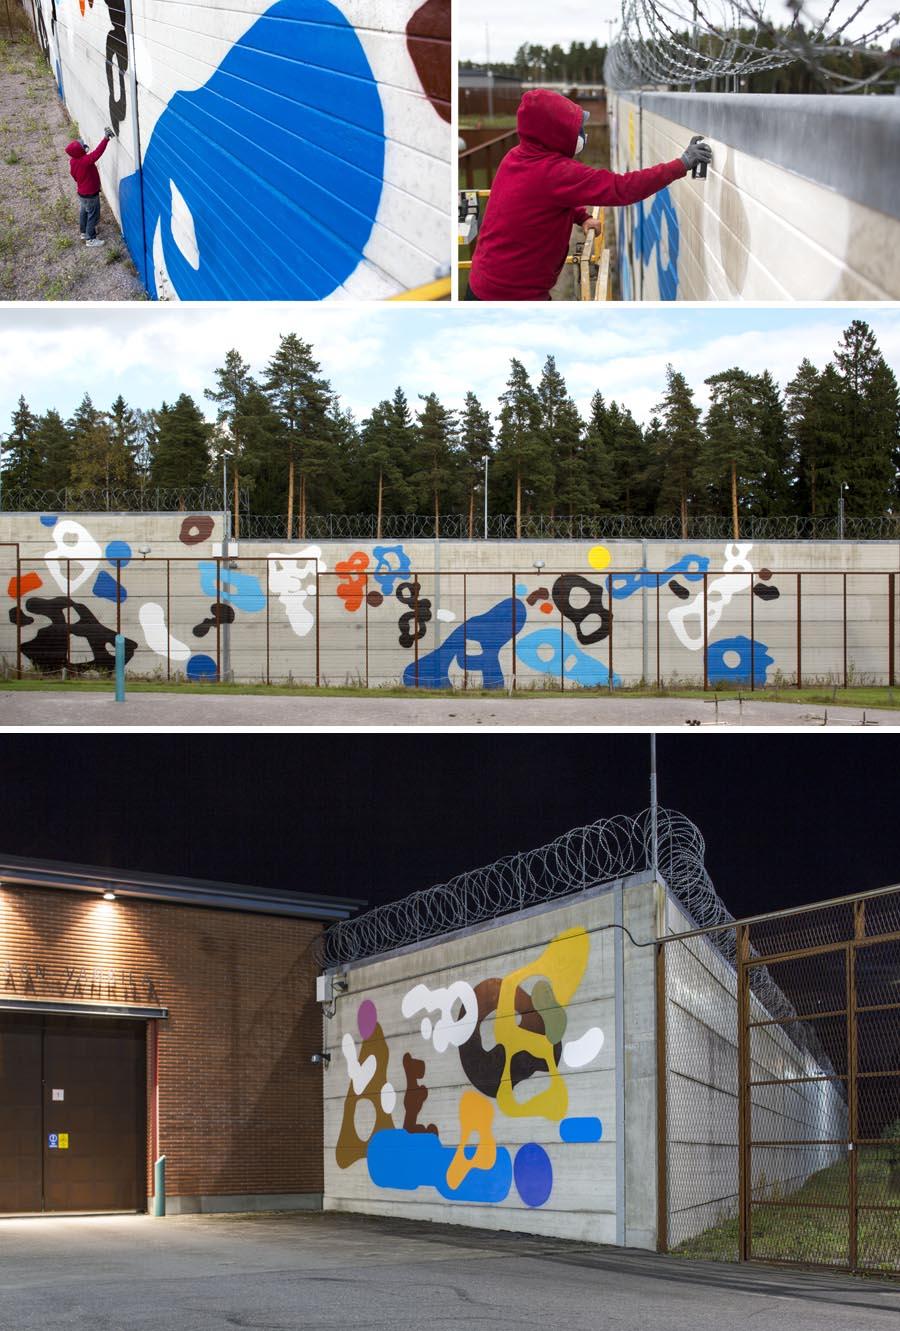 egs helsinki Finland writing my diary contemporary art graffiti postgraffiti urban art cdc wmd msn spraymium